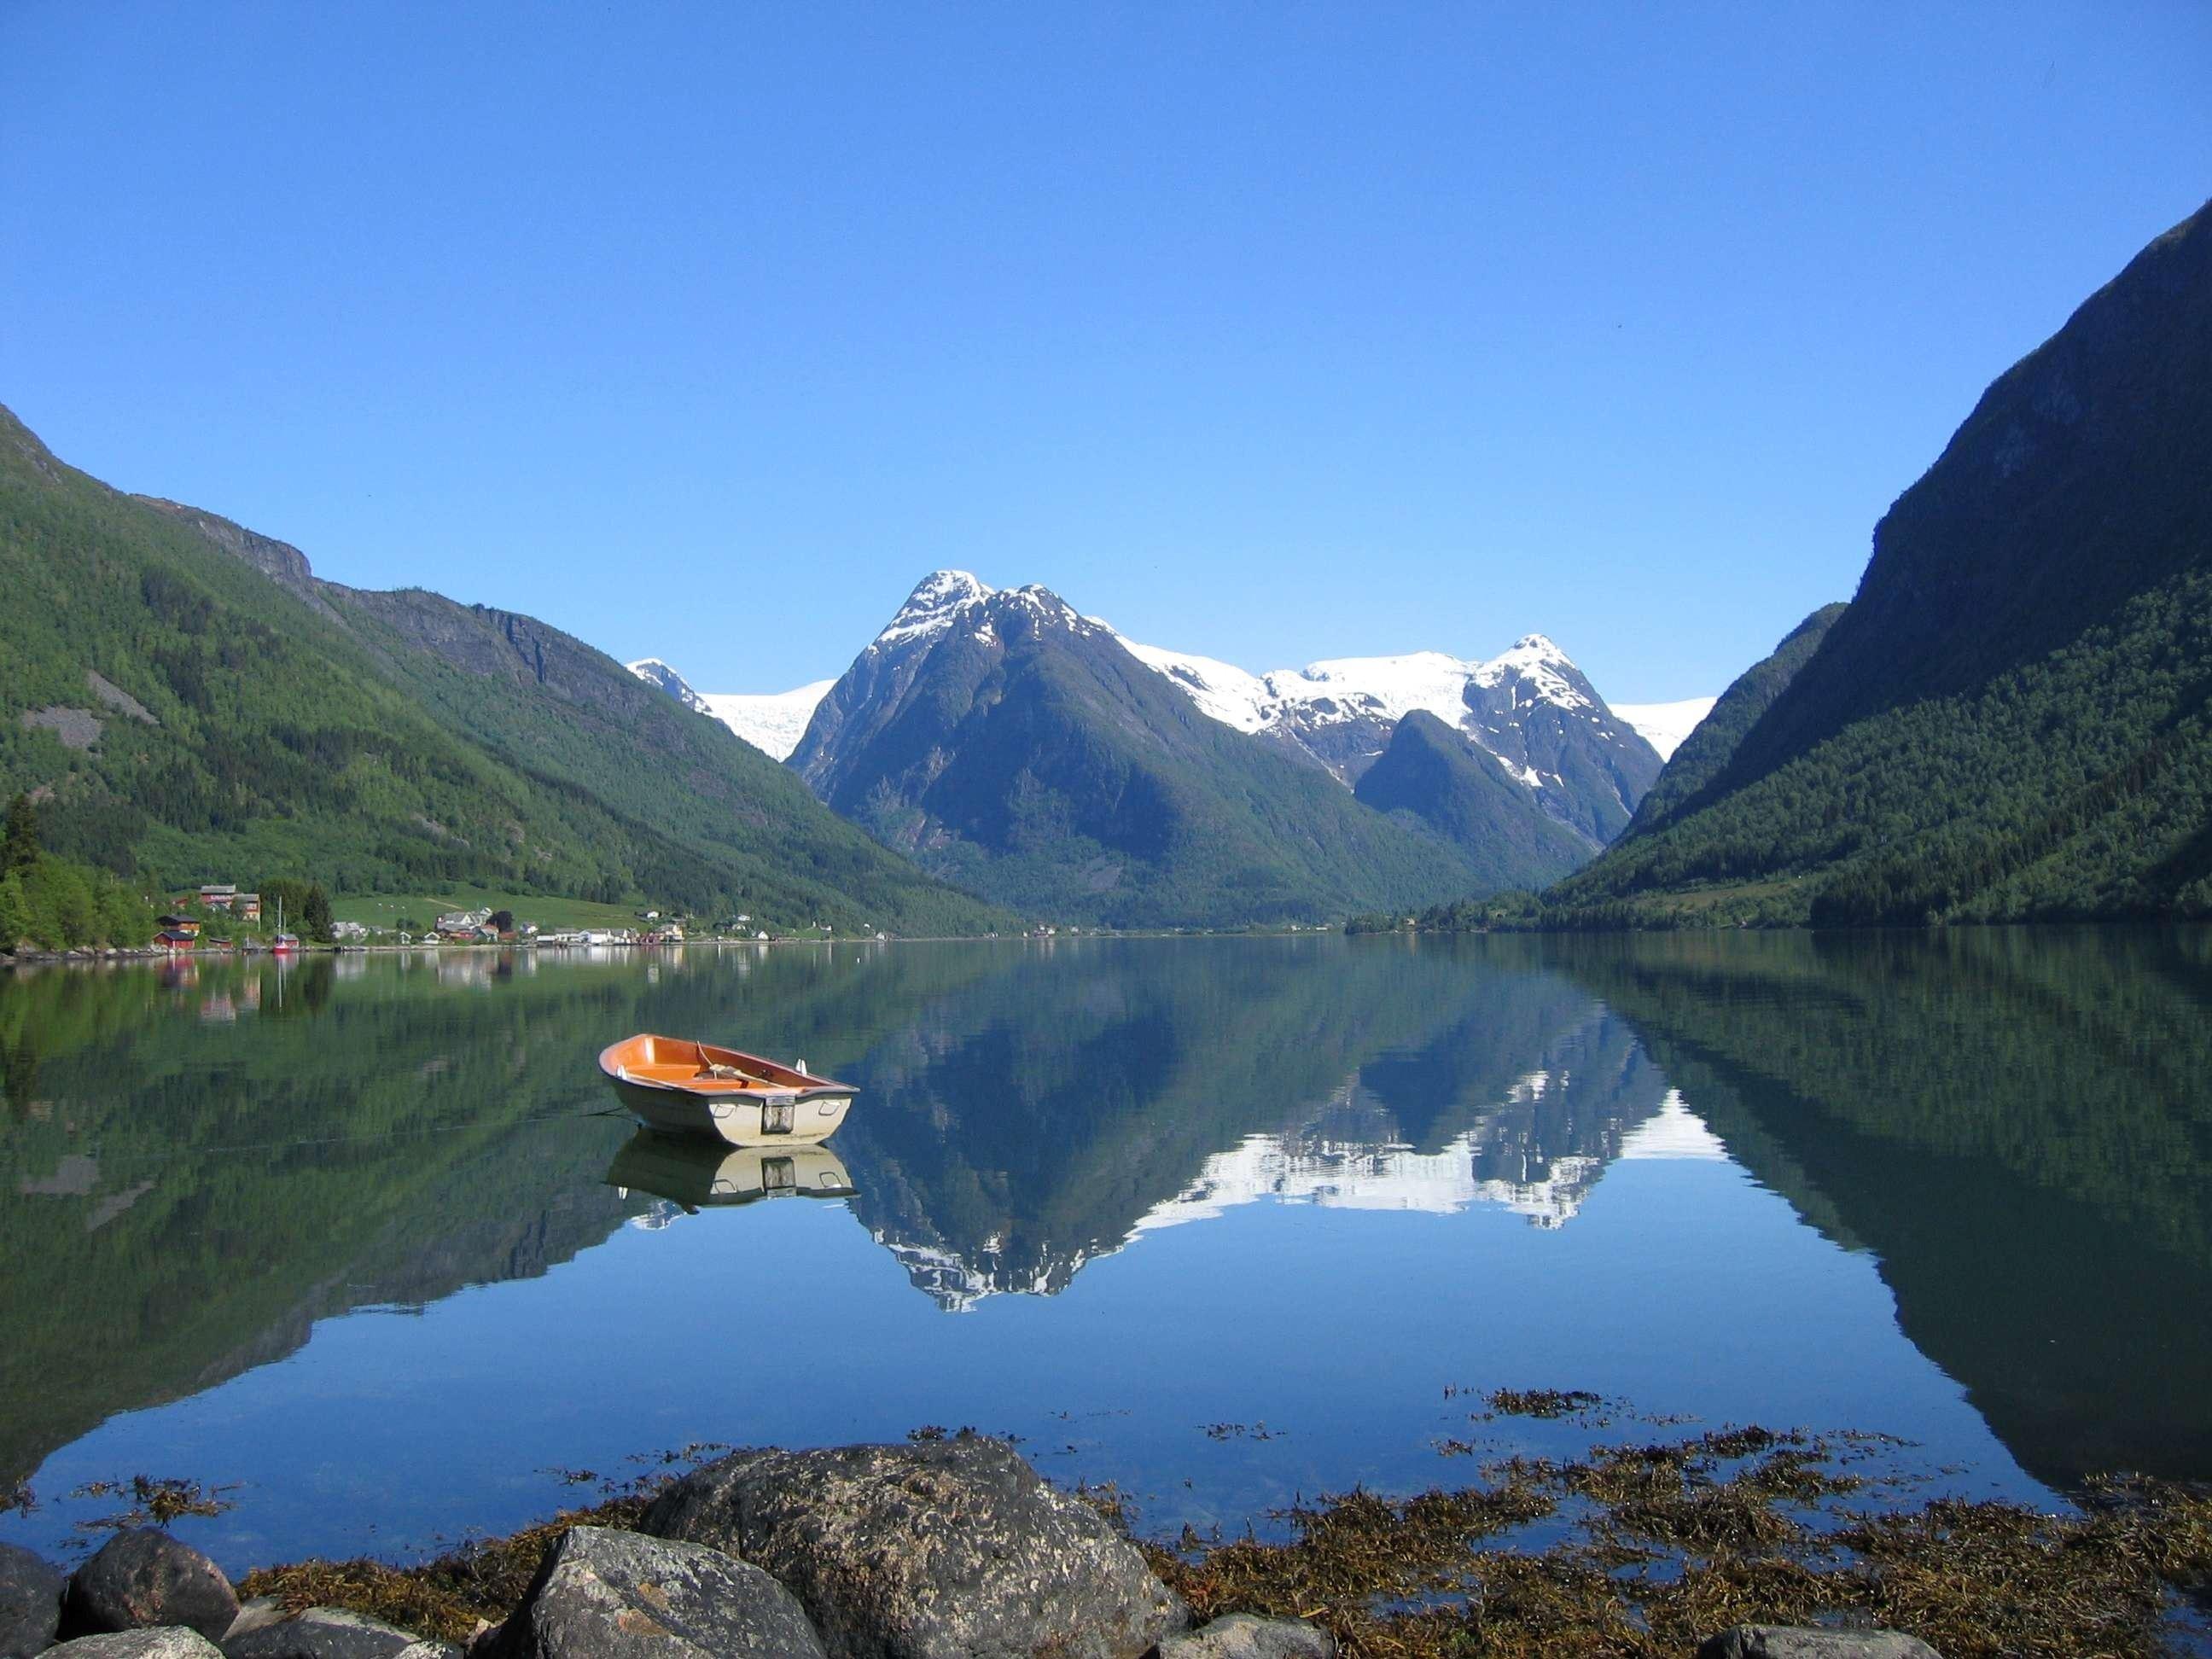 Finn Loftesnes, Fjord Cruise Fjærland half day excursion